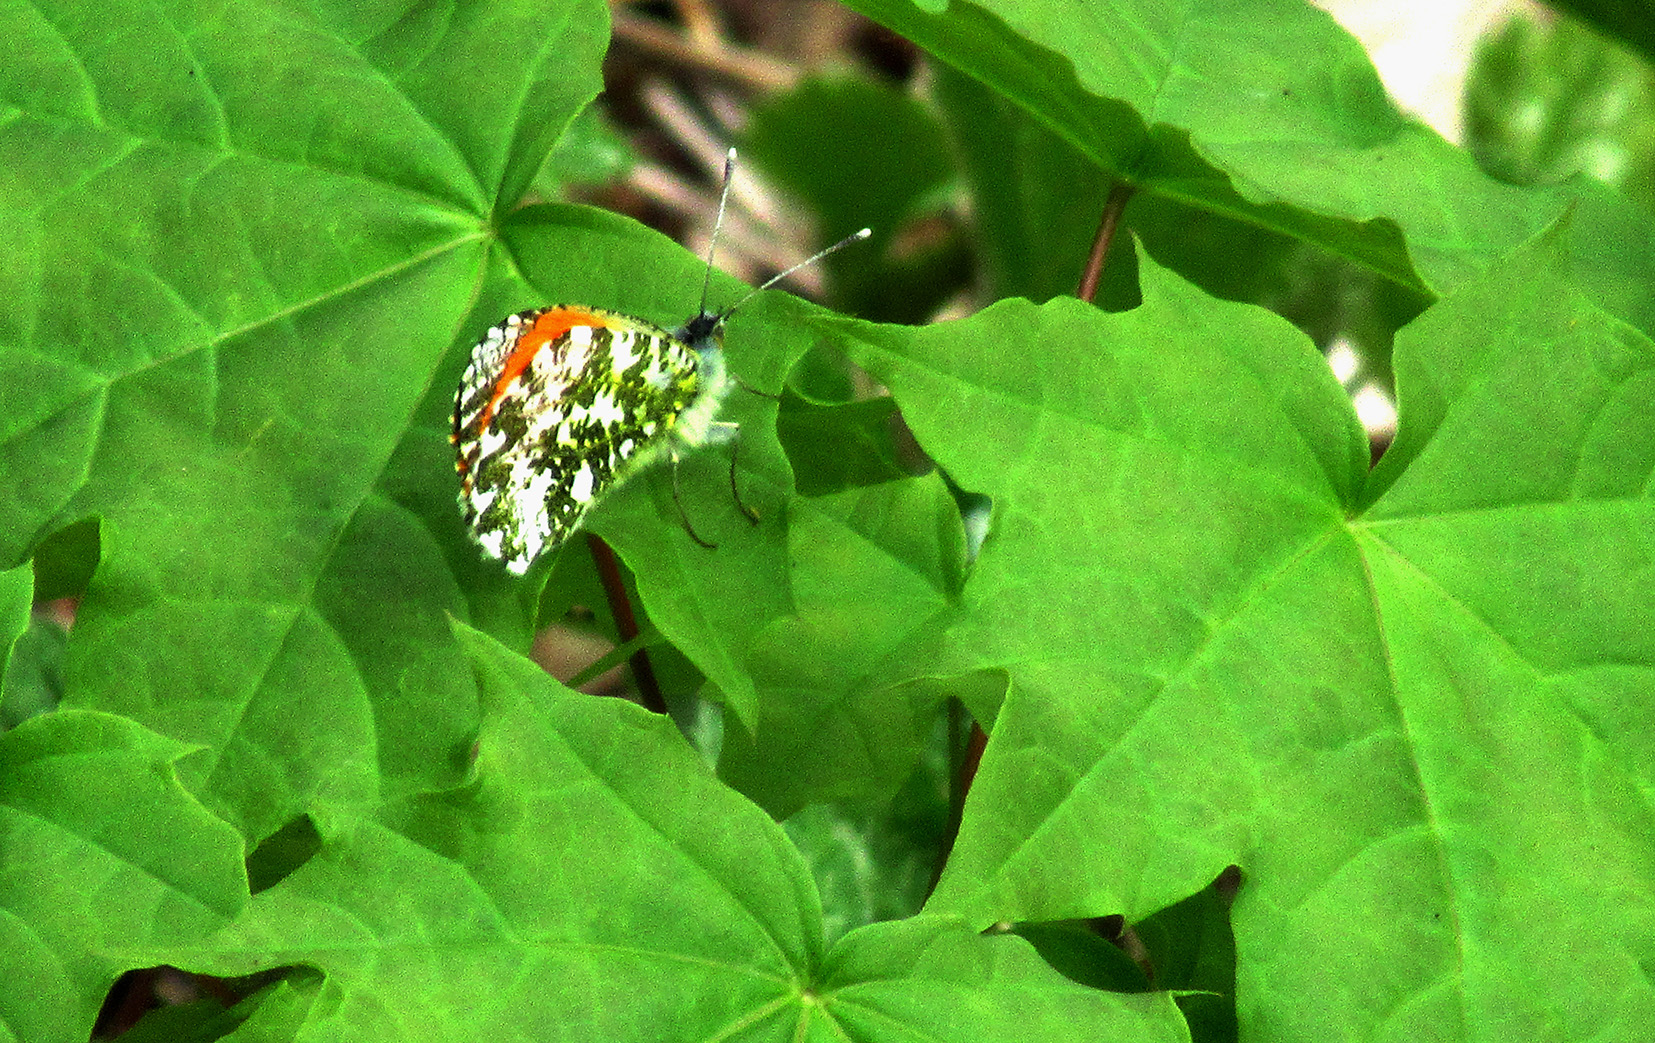 Ook van opzij met ingeklapte vleugels is het een prachtige vlinder – Foto: ©Fransien Fraanje